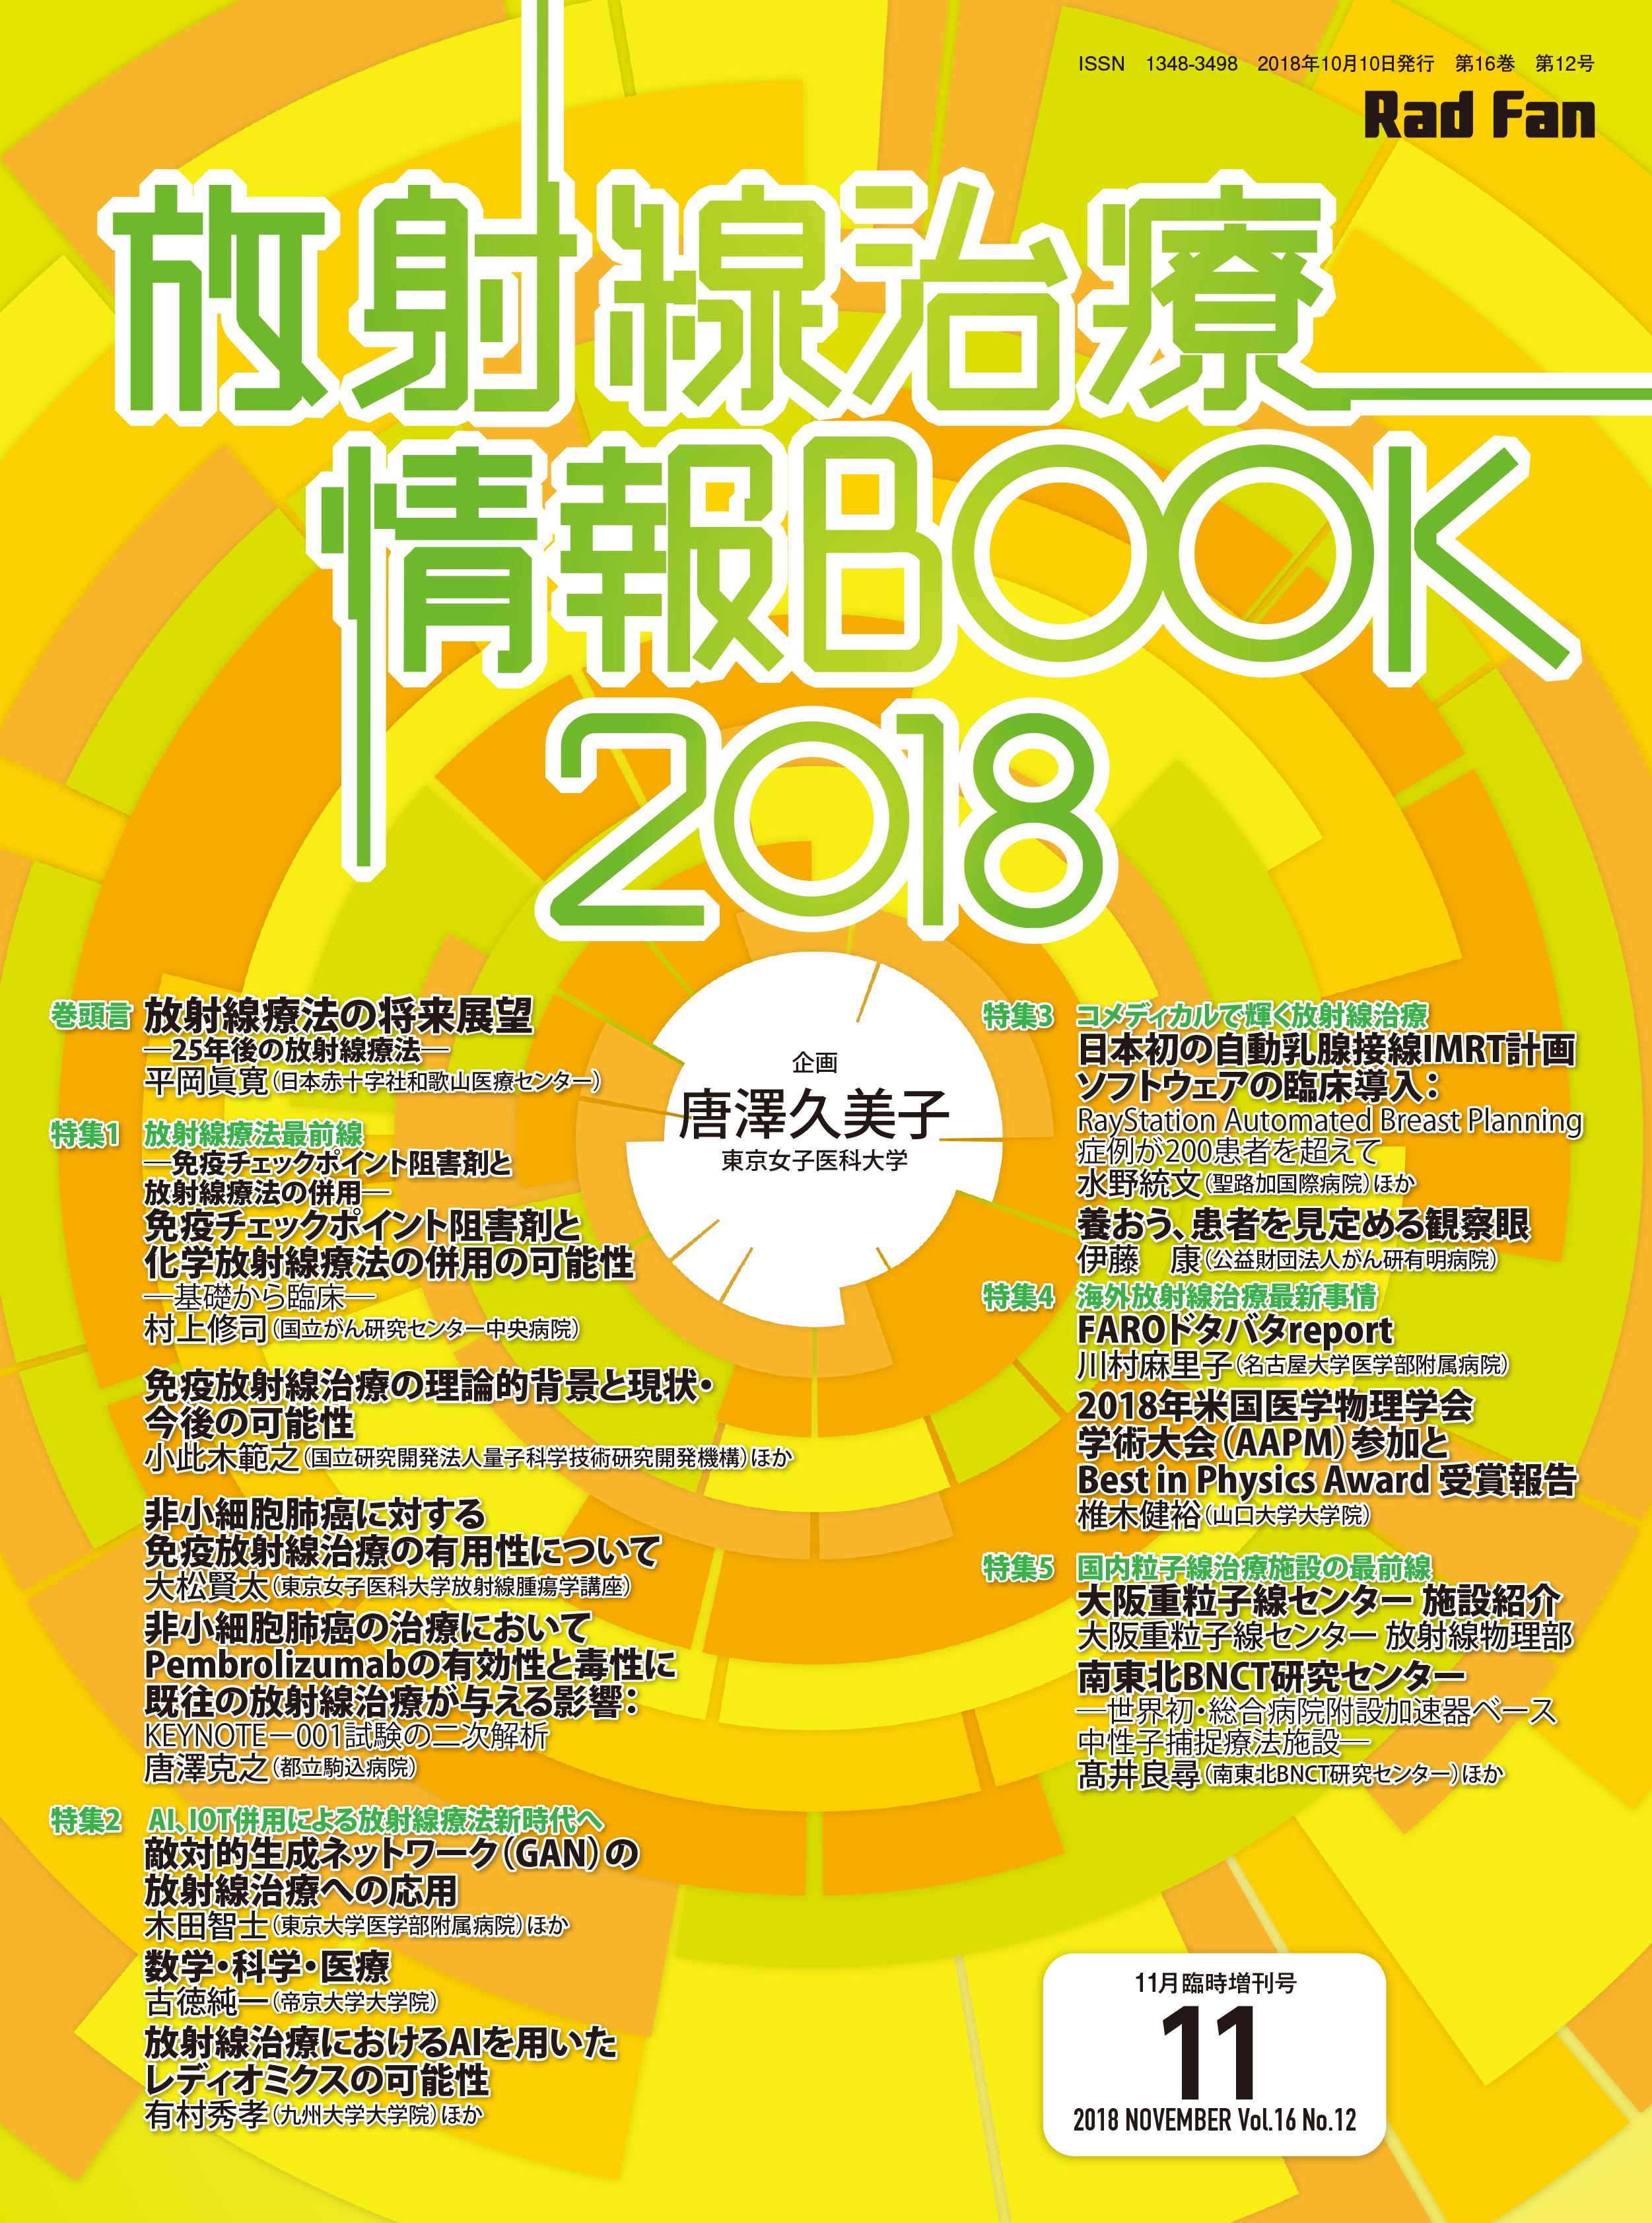 RadFan 放射線治療情報BOOK2018